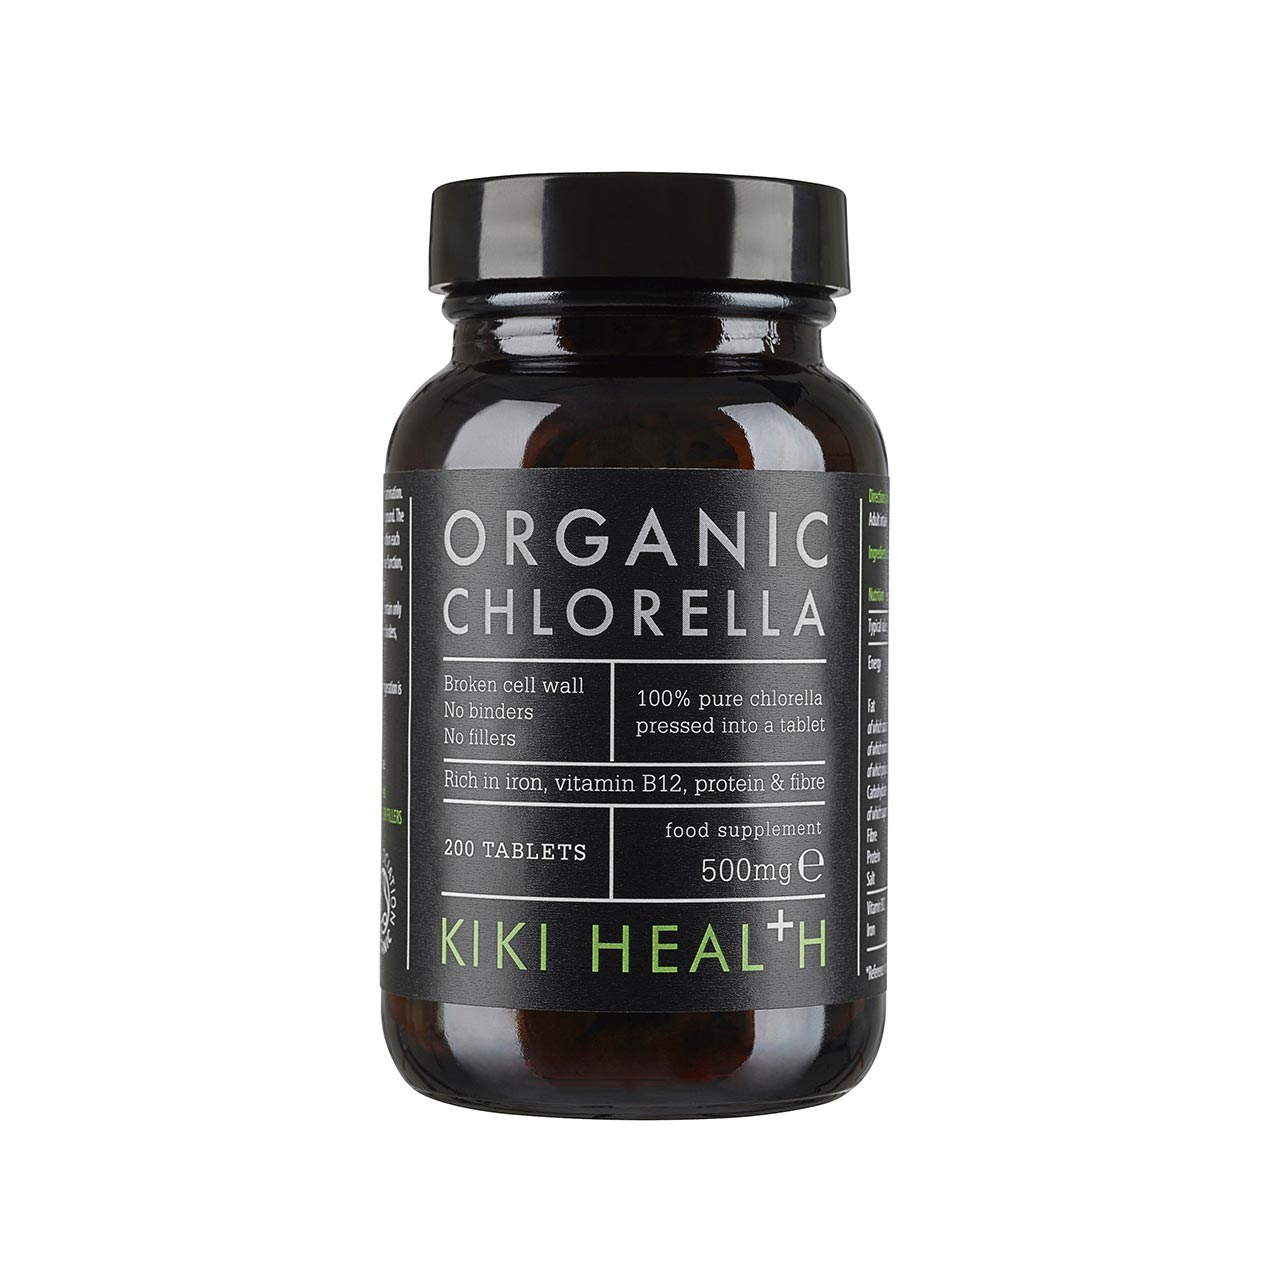 Organic Chlorella 200's